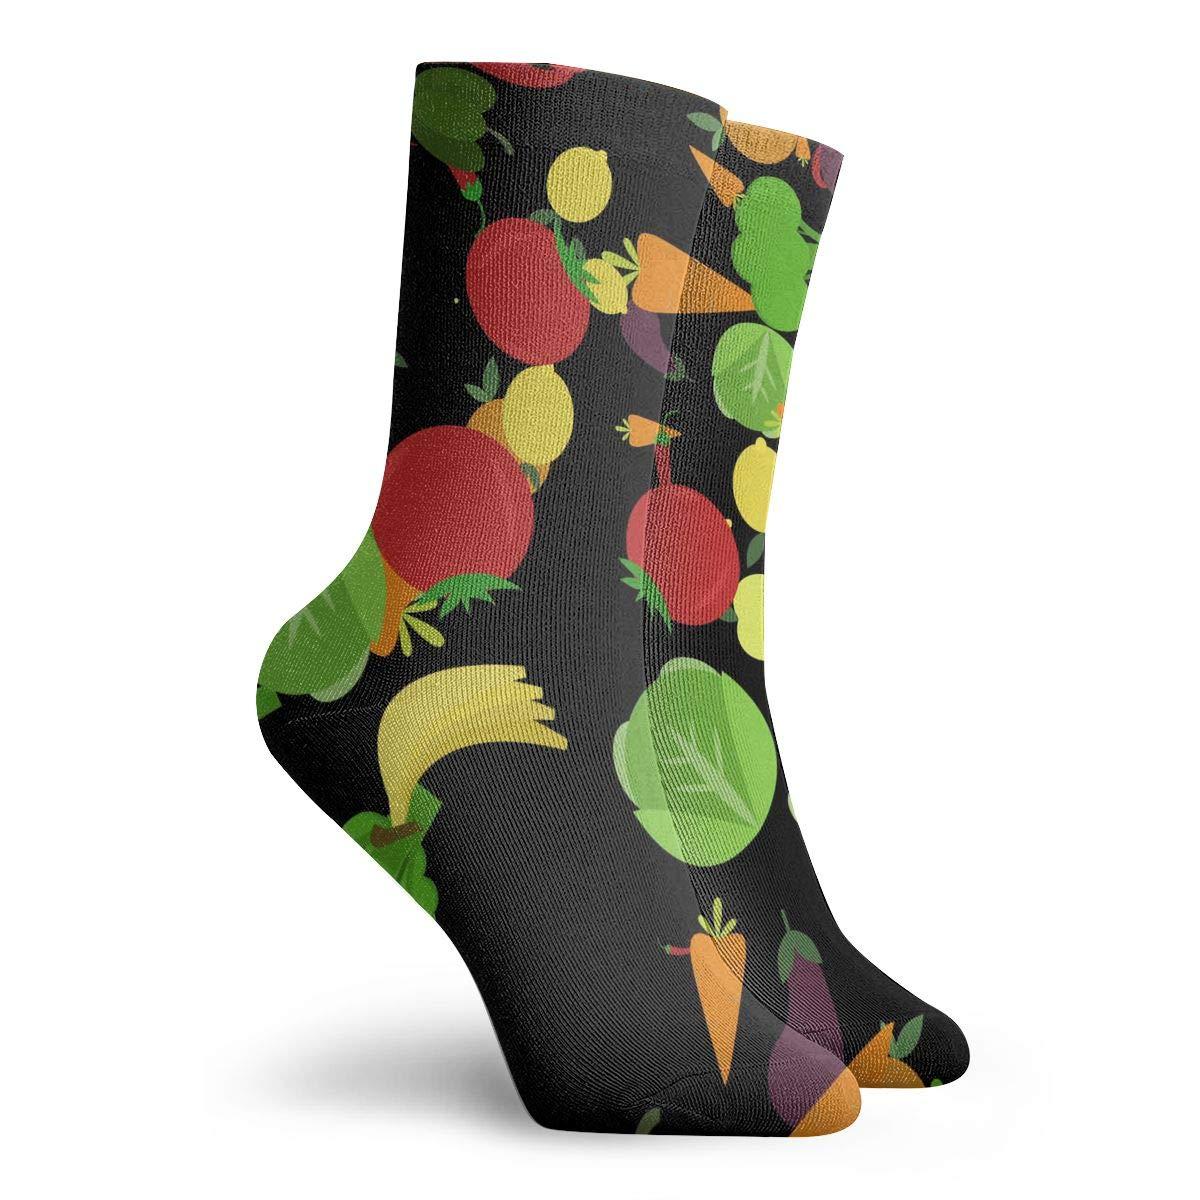 Pattern Unisex Funny Casual Crew Socks Athletic Socks For Boys Girls Kids Teenagers